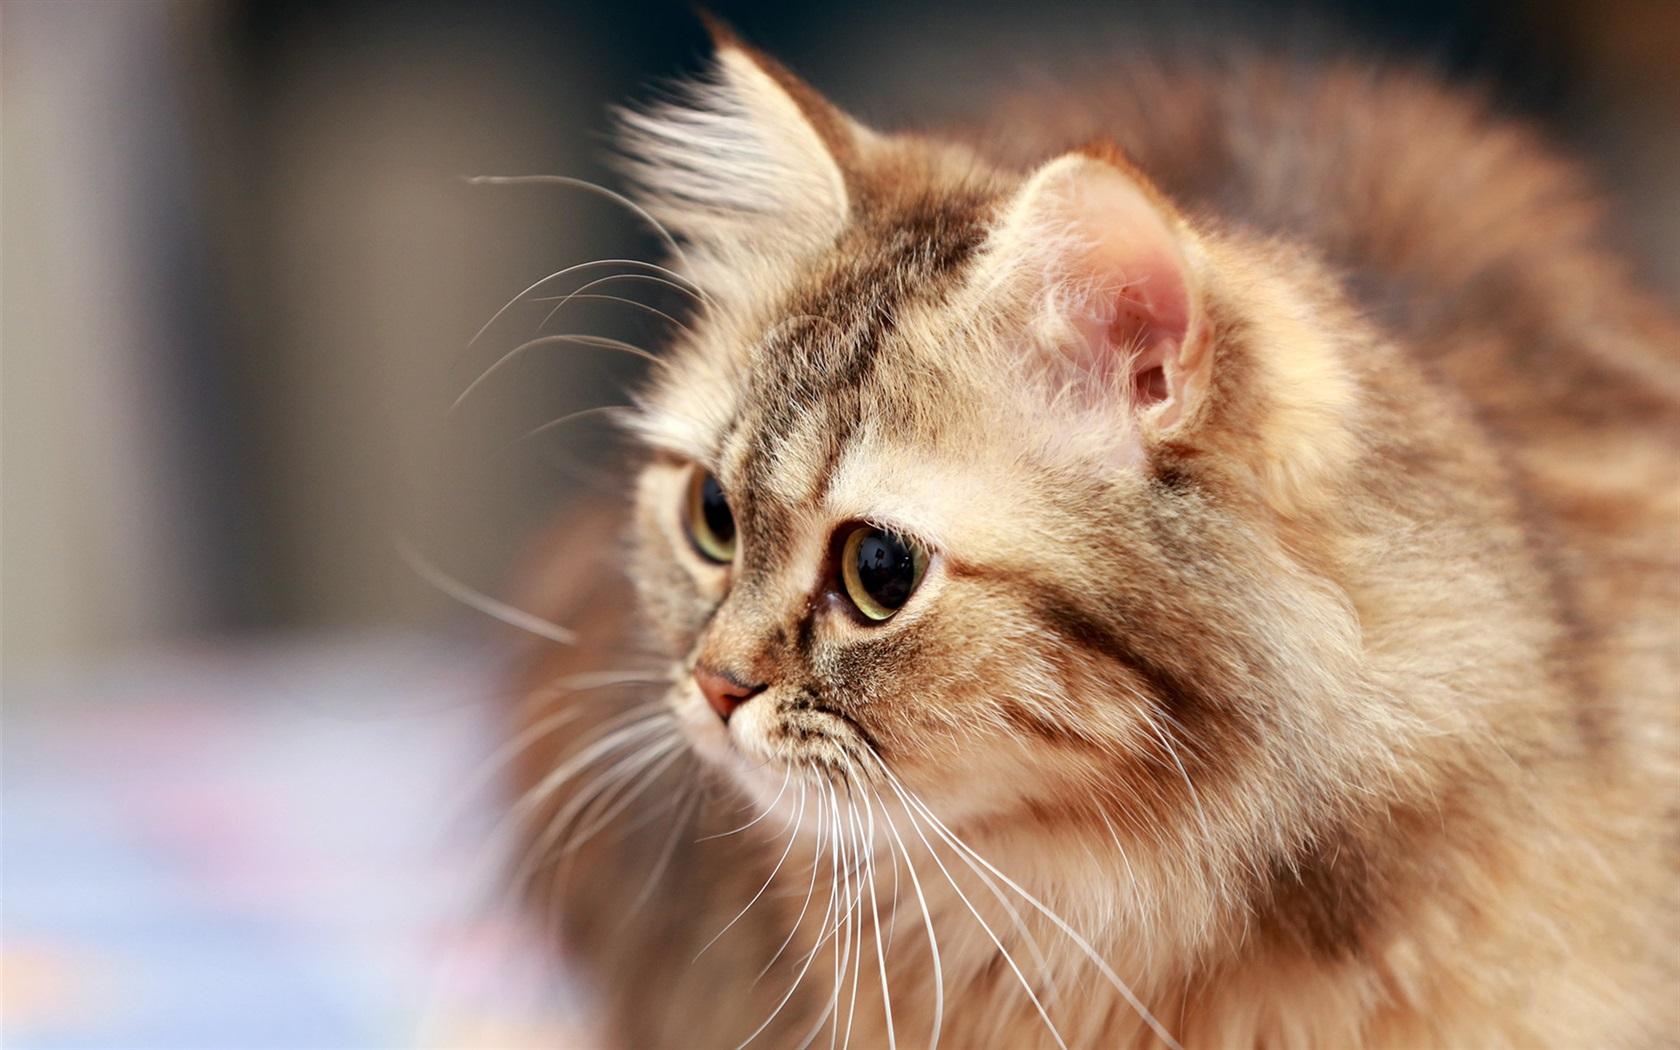 Fonds d 39 cran t l charger 1680x1050 chat fluffy moustache yeux fond hd - Herbe a chat seche ...